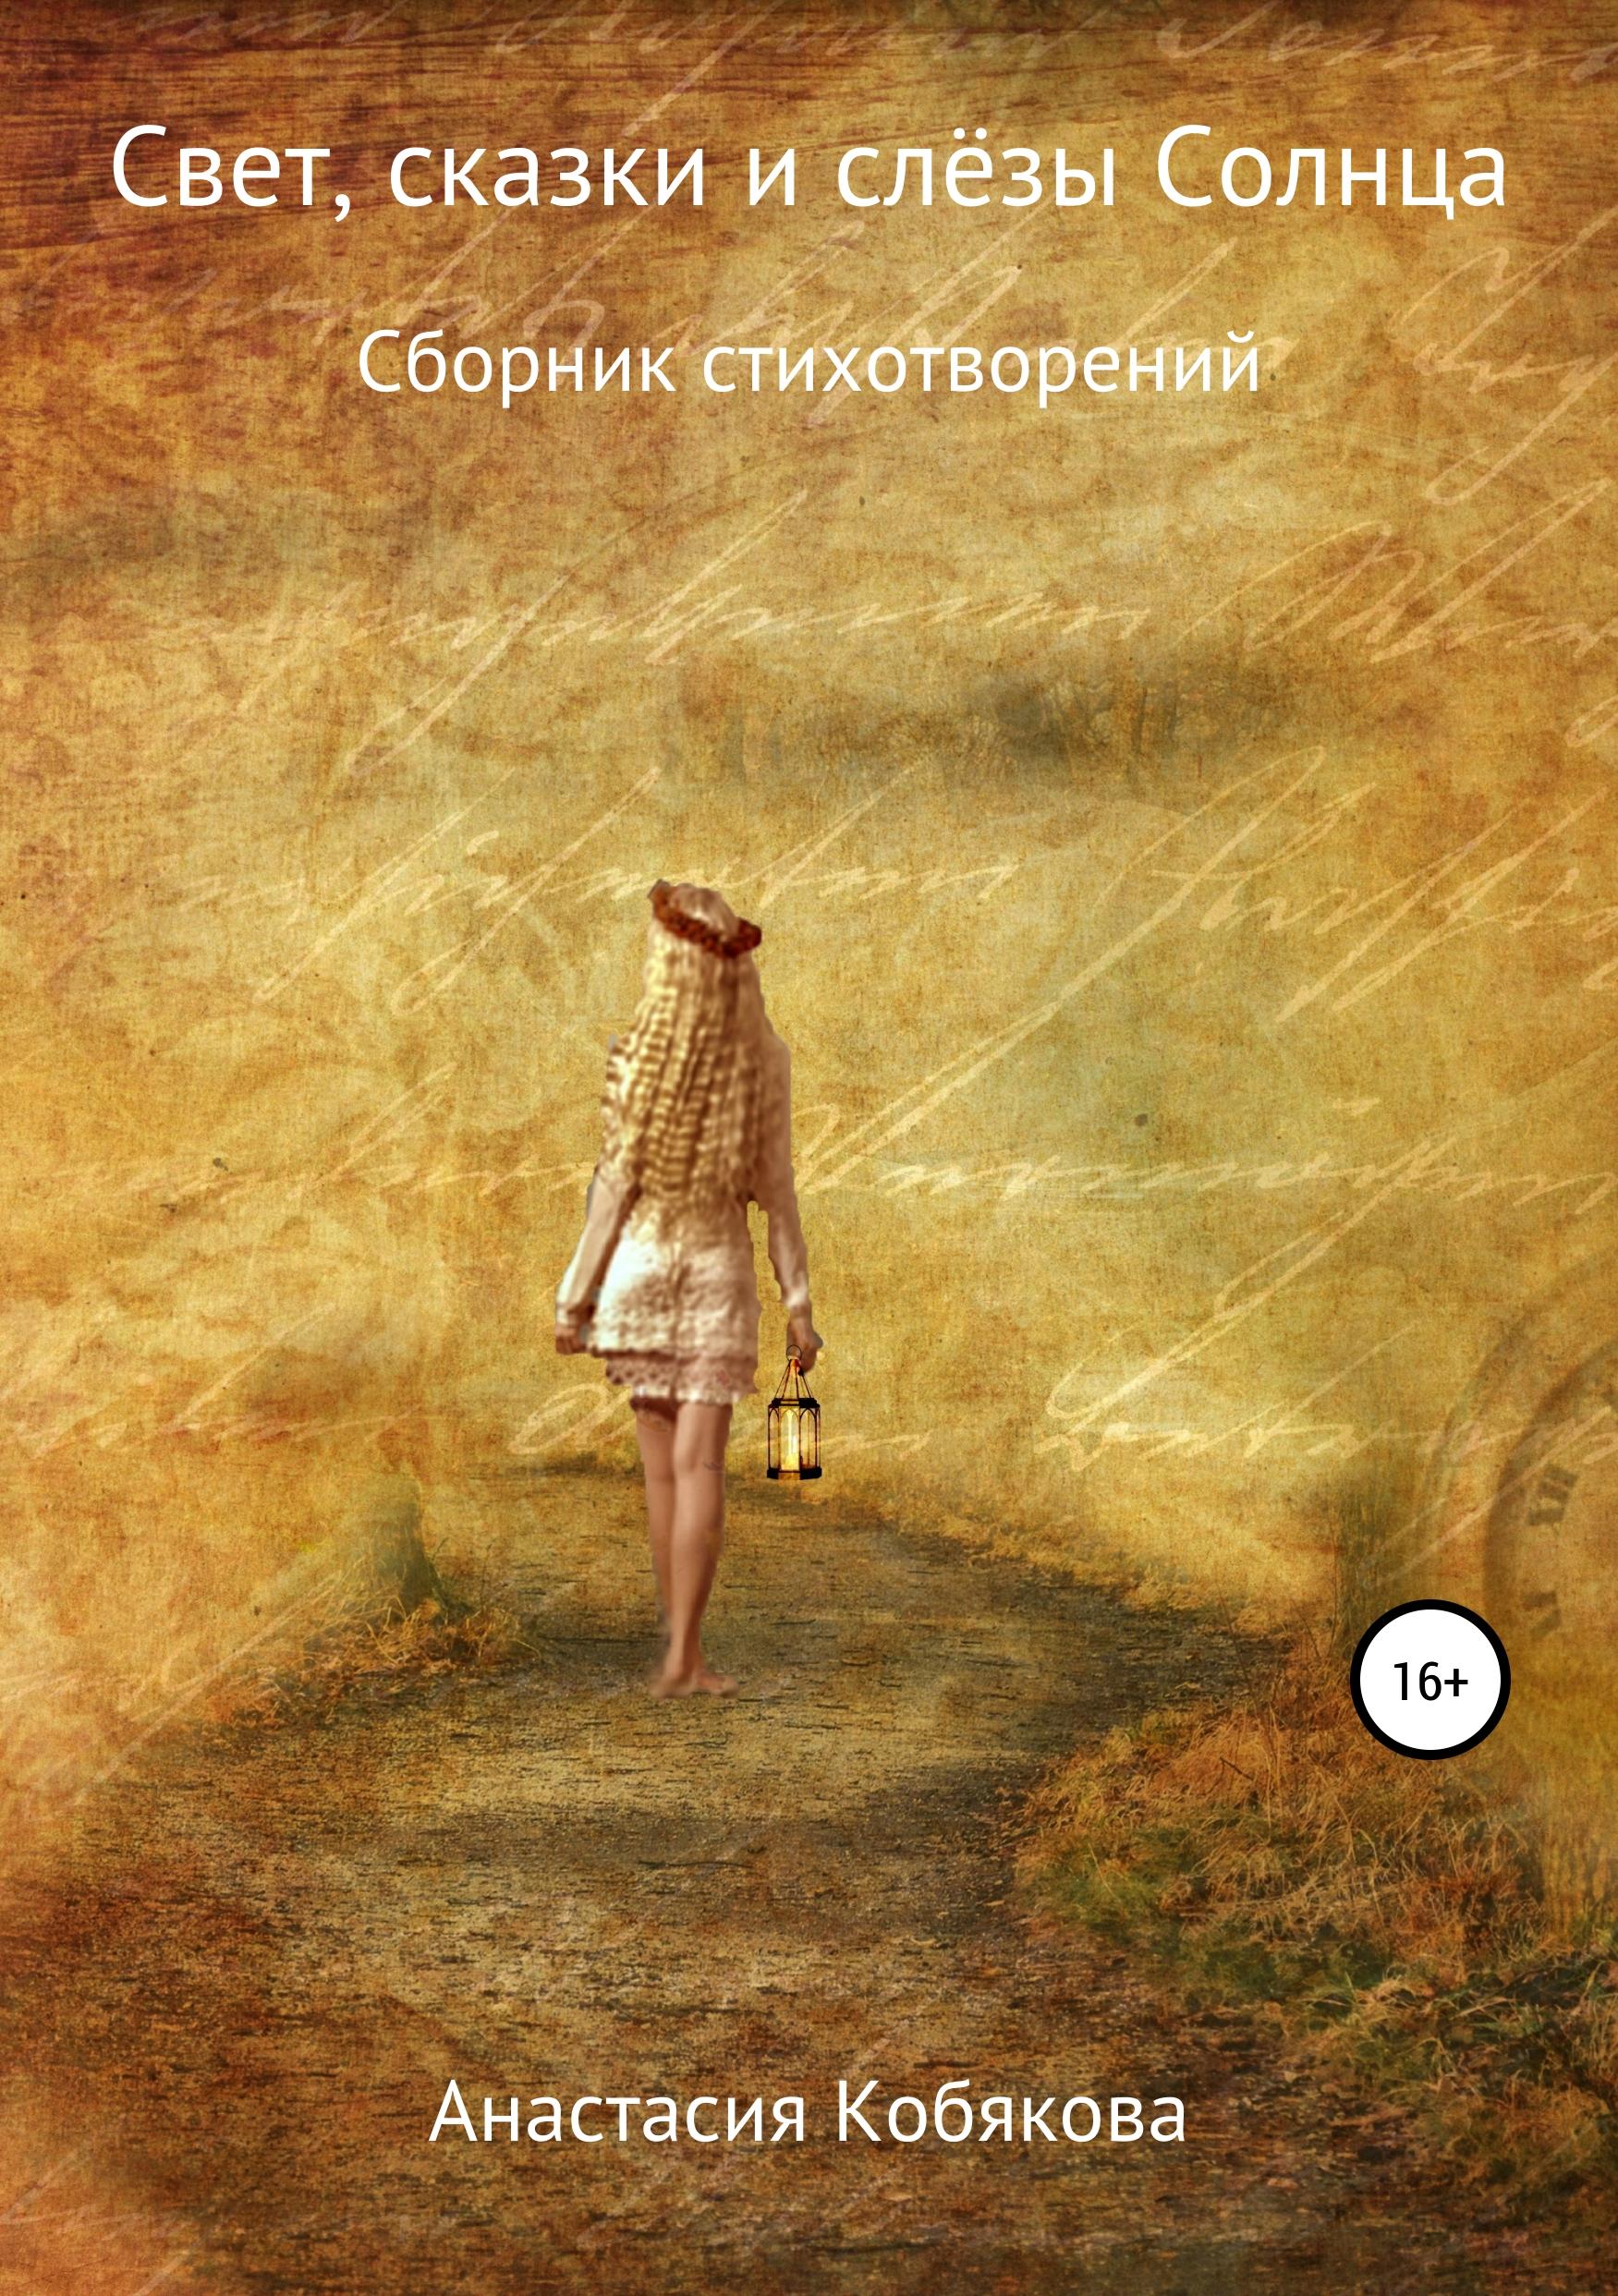 Анастасия Кобякова Свет, сказки и слёзы Солнца цена